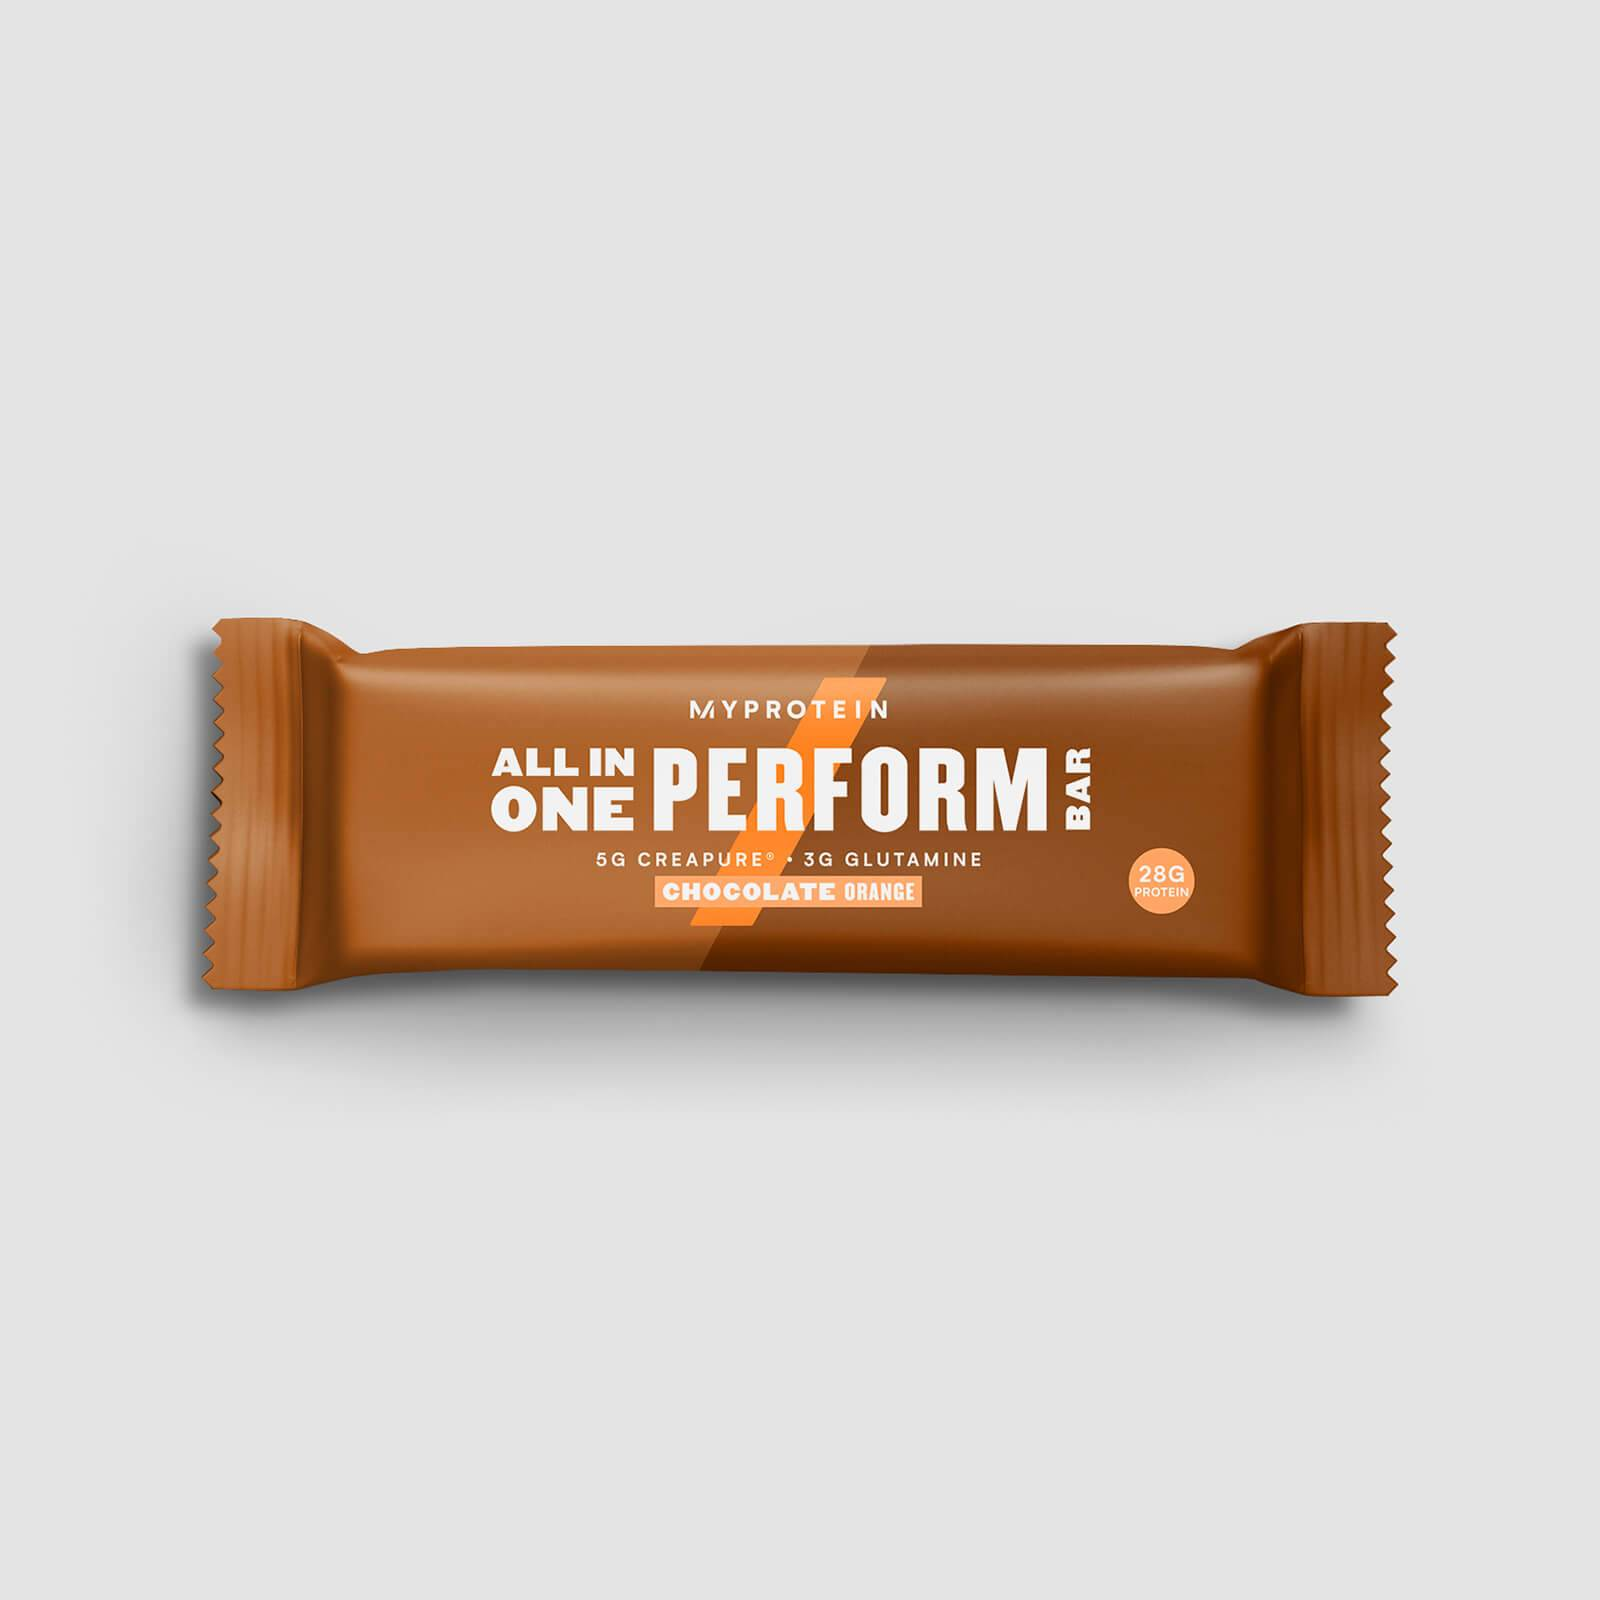 Myprotein All-In-One Perform Bar (Sample) - Chocolate Orange